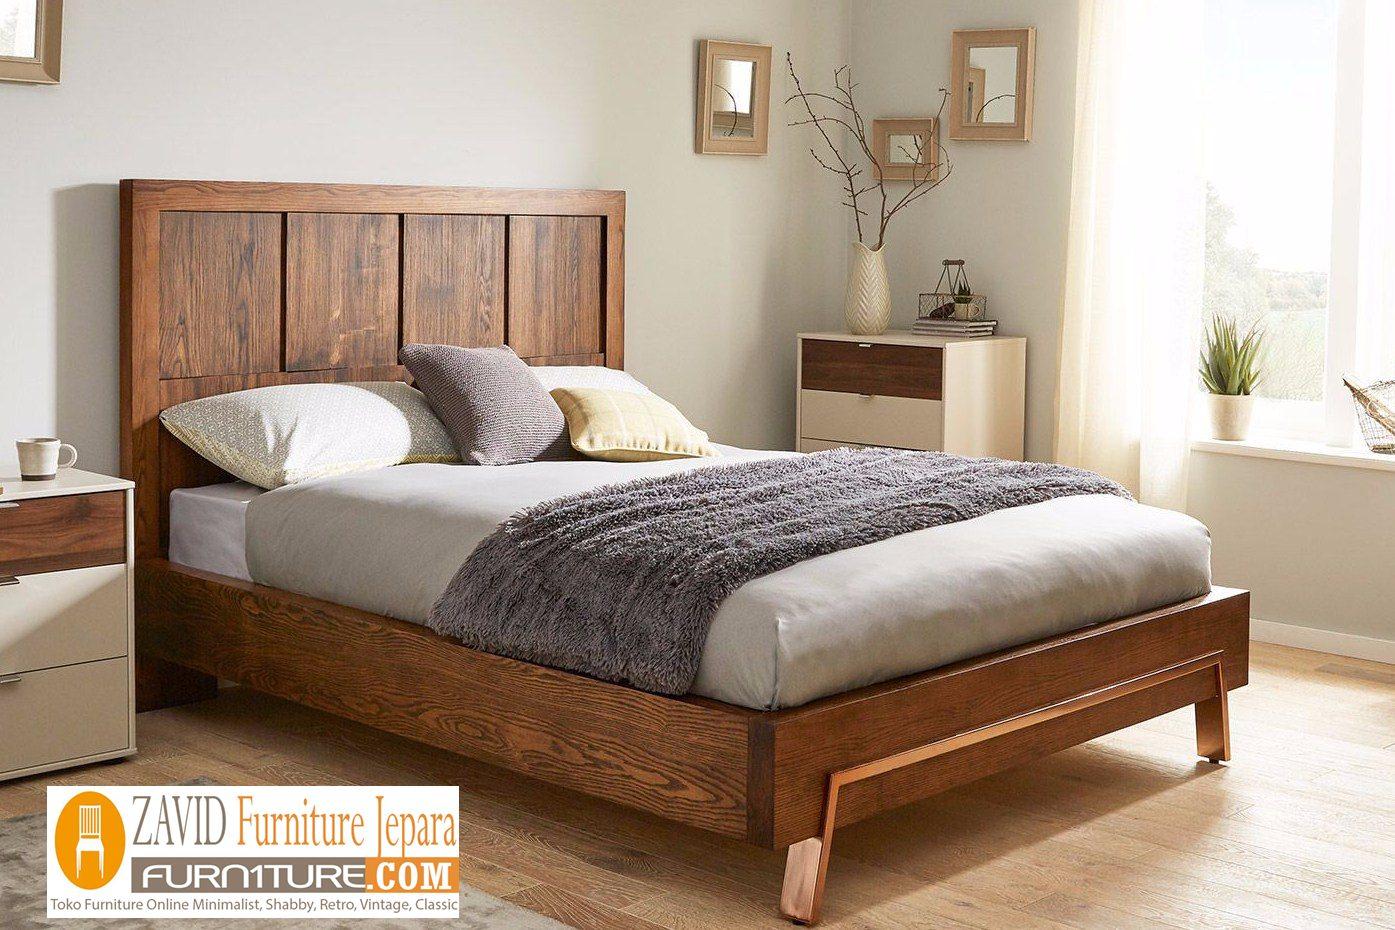 tempat tidur kayu jati minimalis - Tempat Tidur Cirebon Minimalis Kayu Jati Modern